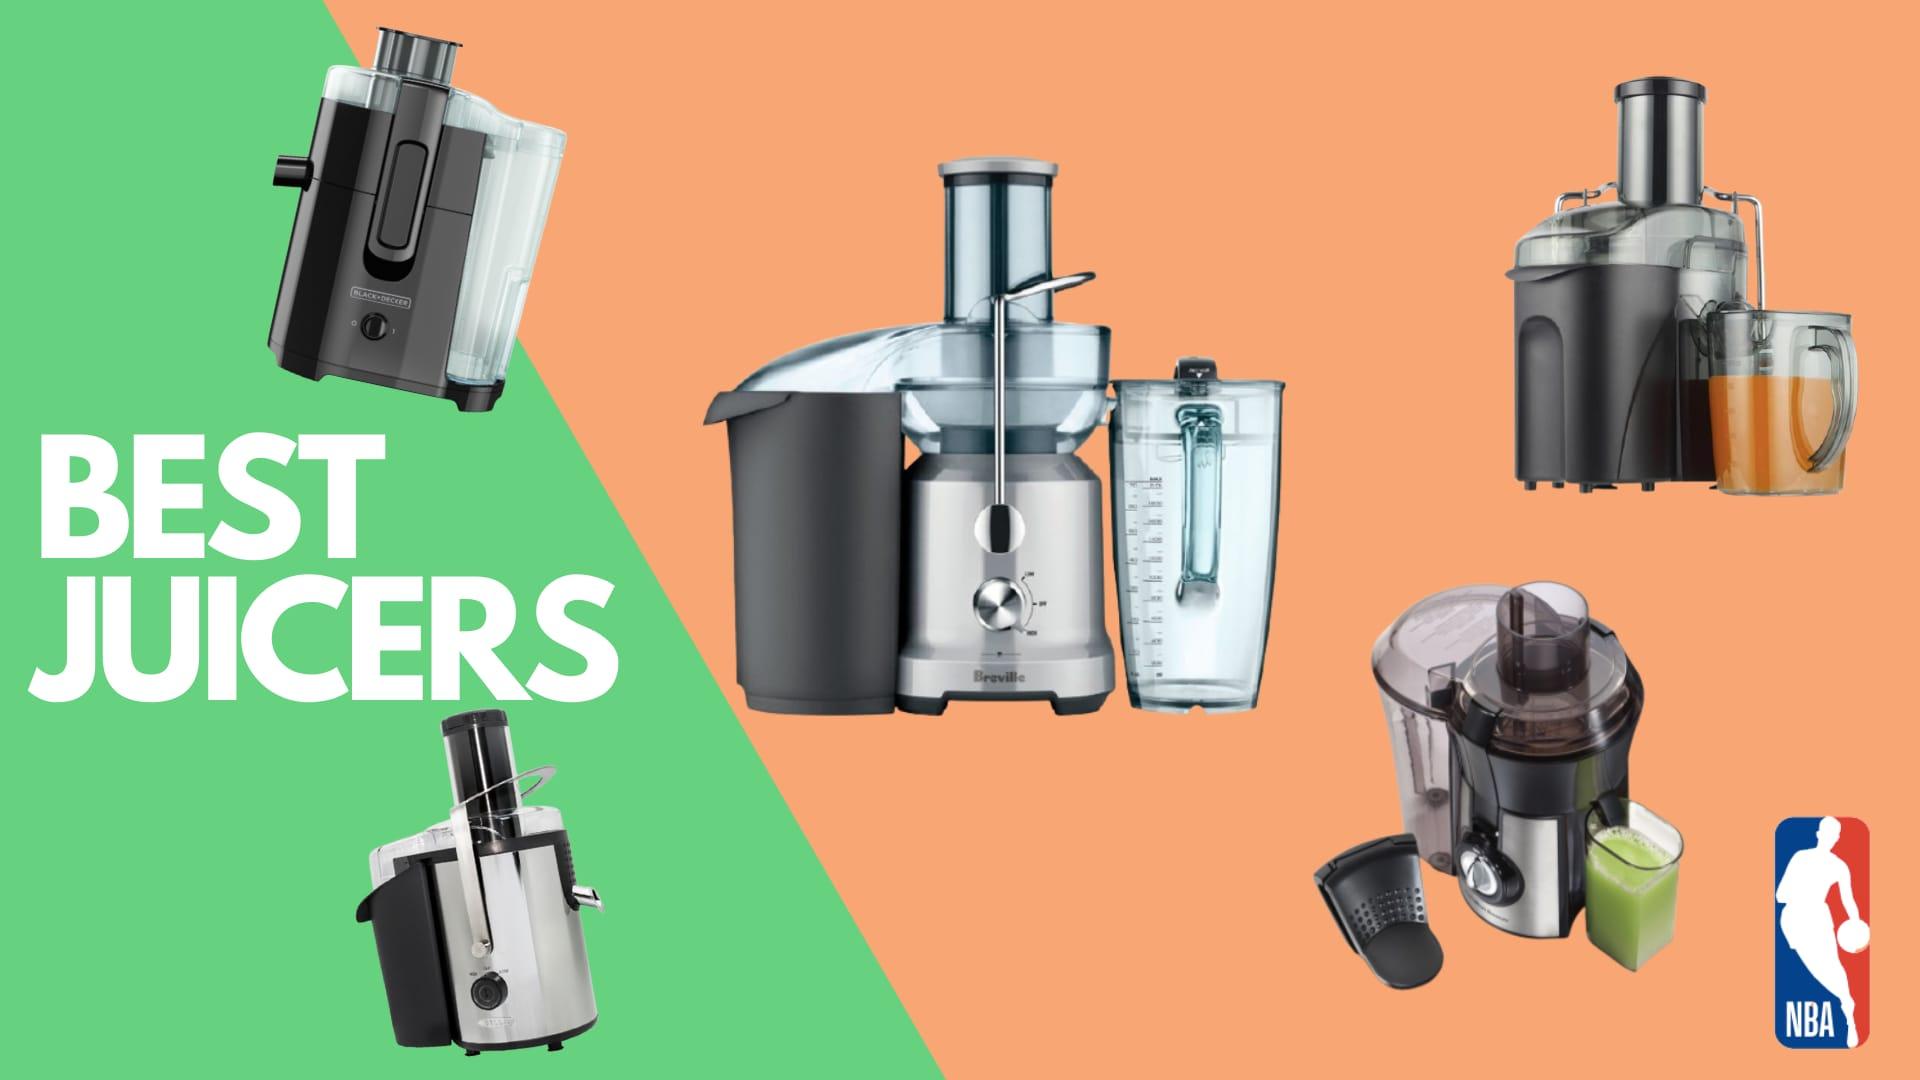 Best juicers to kickstart your morning